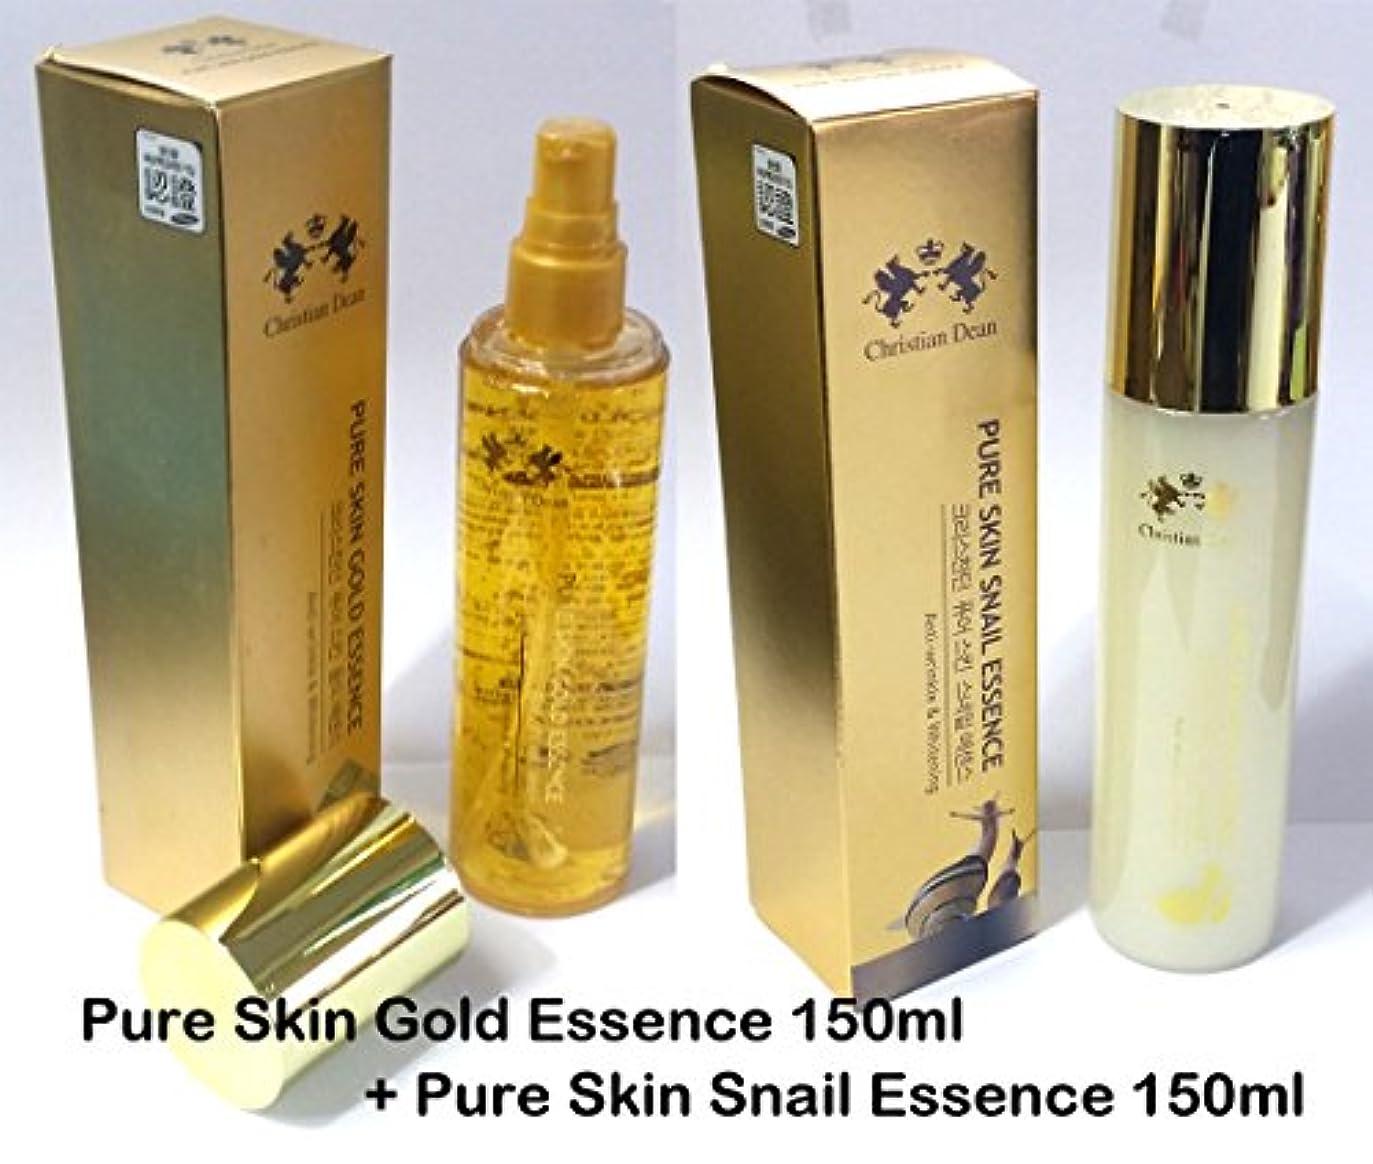 [Christian Dean] ピュアスキンゴールドエッセンス150ml +ピュアスキンカタツムエッセンス150ml / Pure Skin Gold Essence 150ml + Pure Skin Snail Essence...